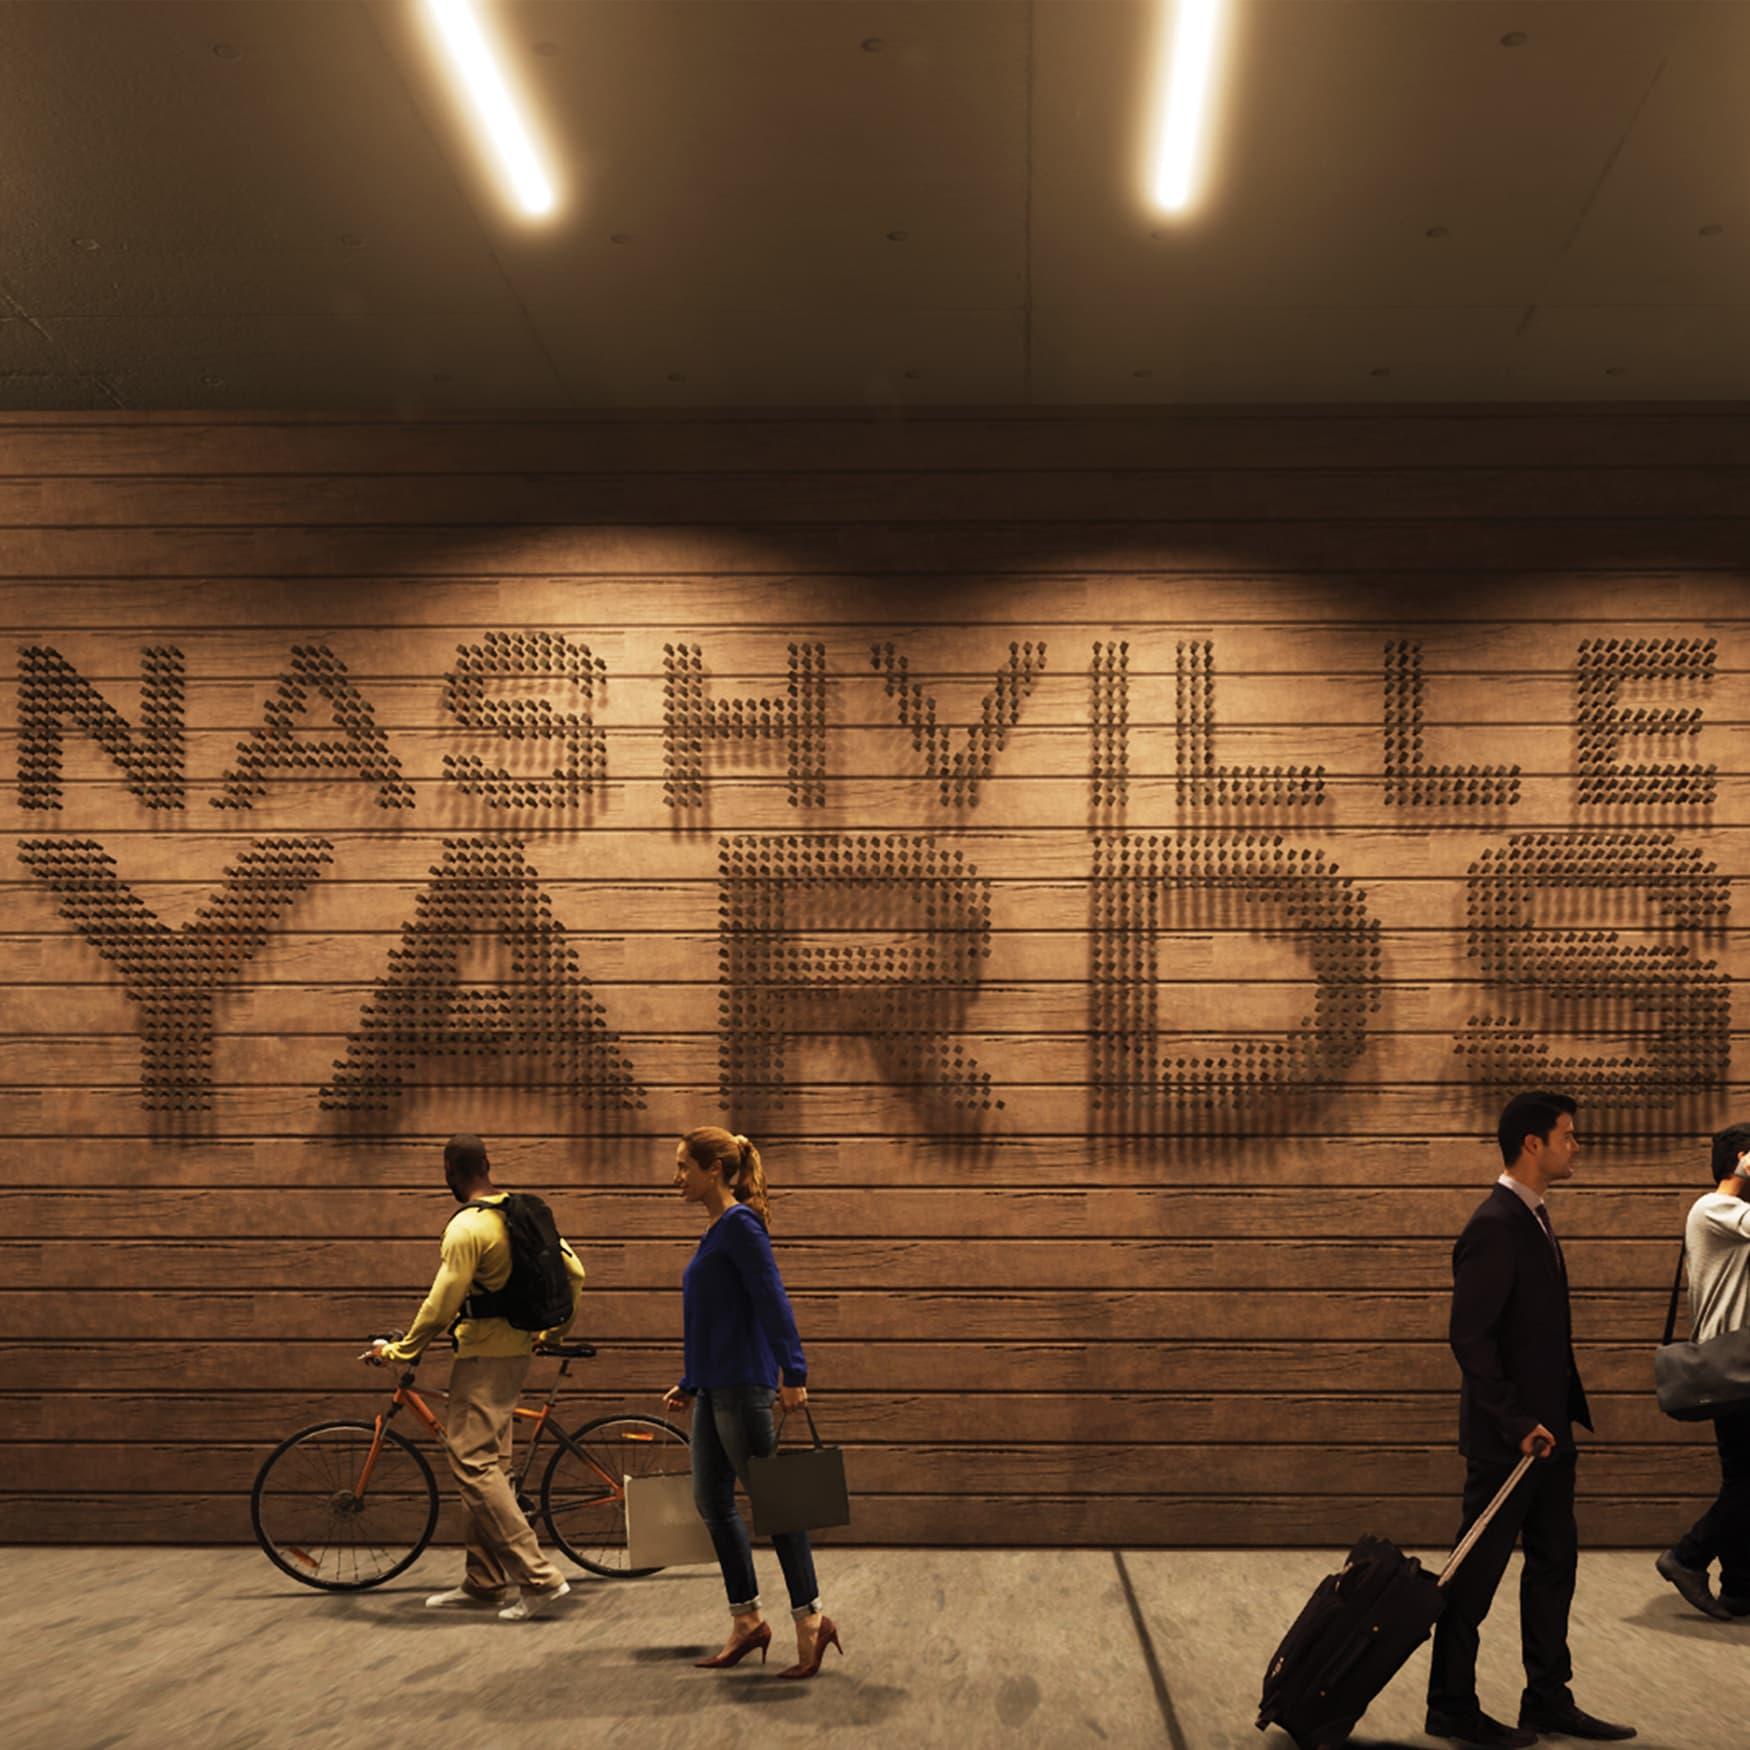 Artful Nashville Yards identity signage by RSM Design